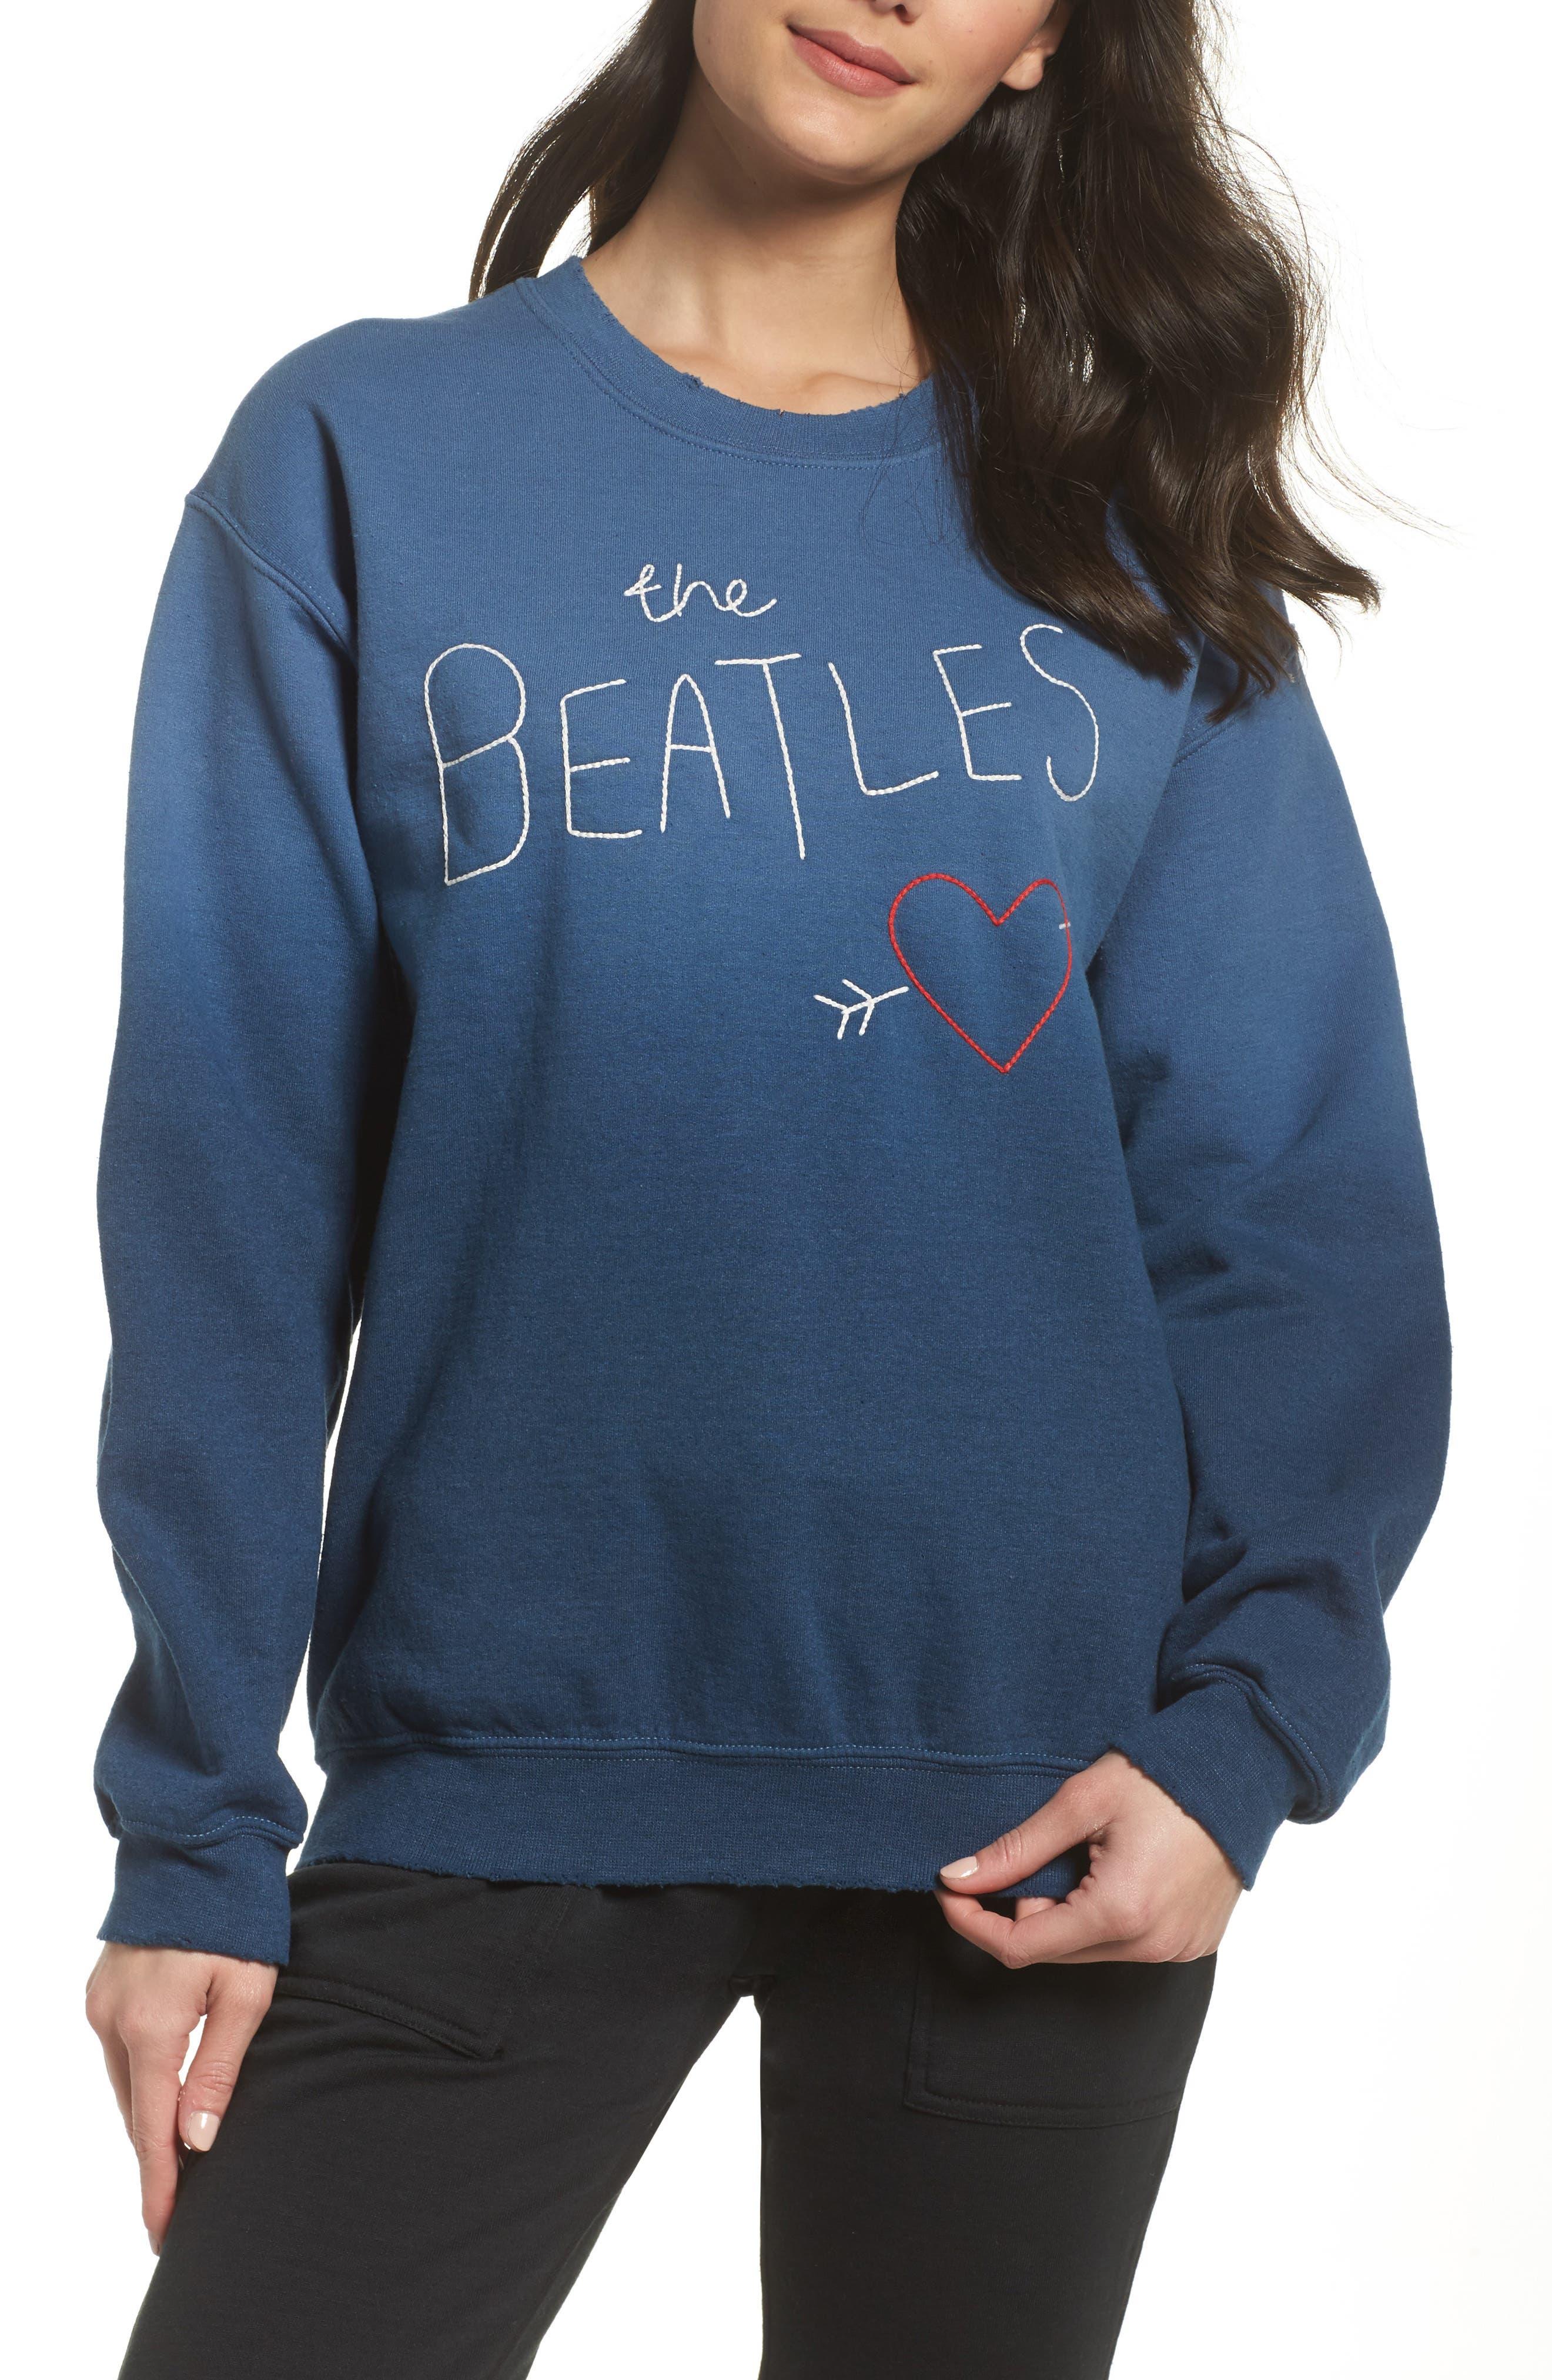 The Beatles Ombré Sweatshirt,                         Main,                         color, True Navy